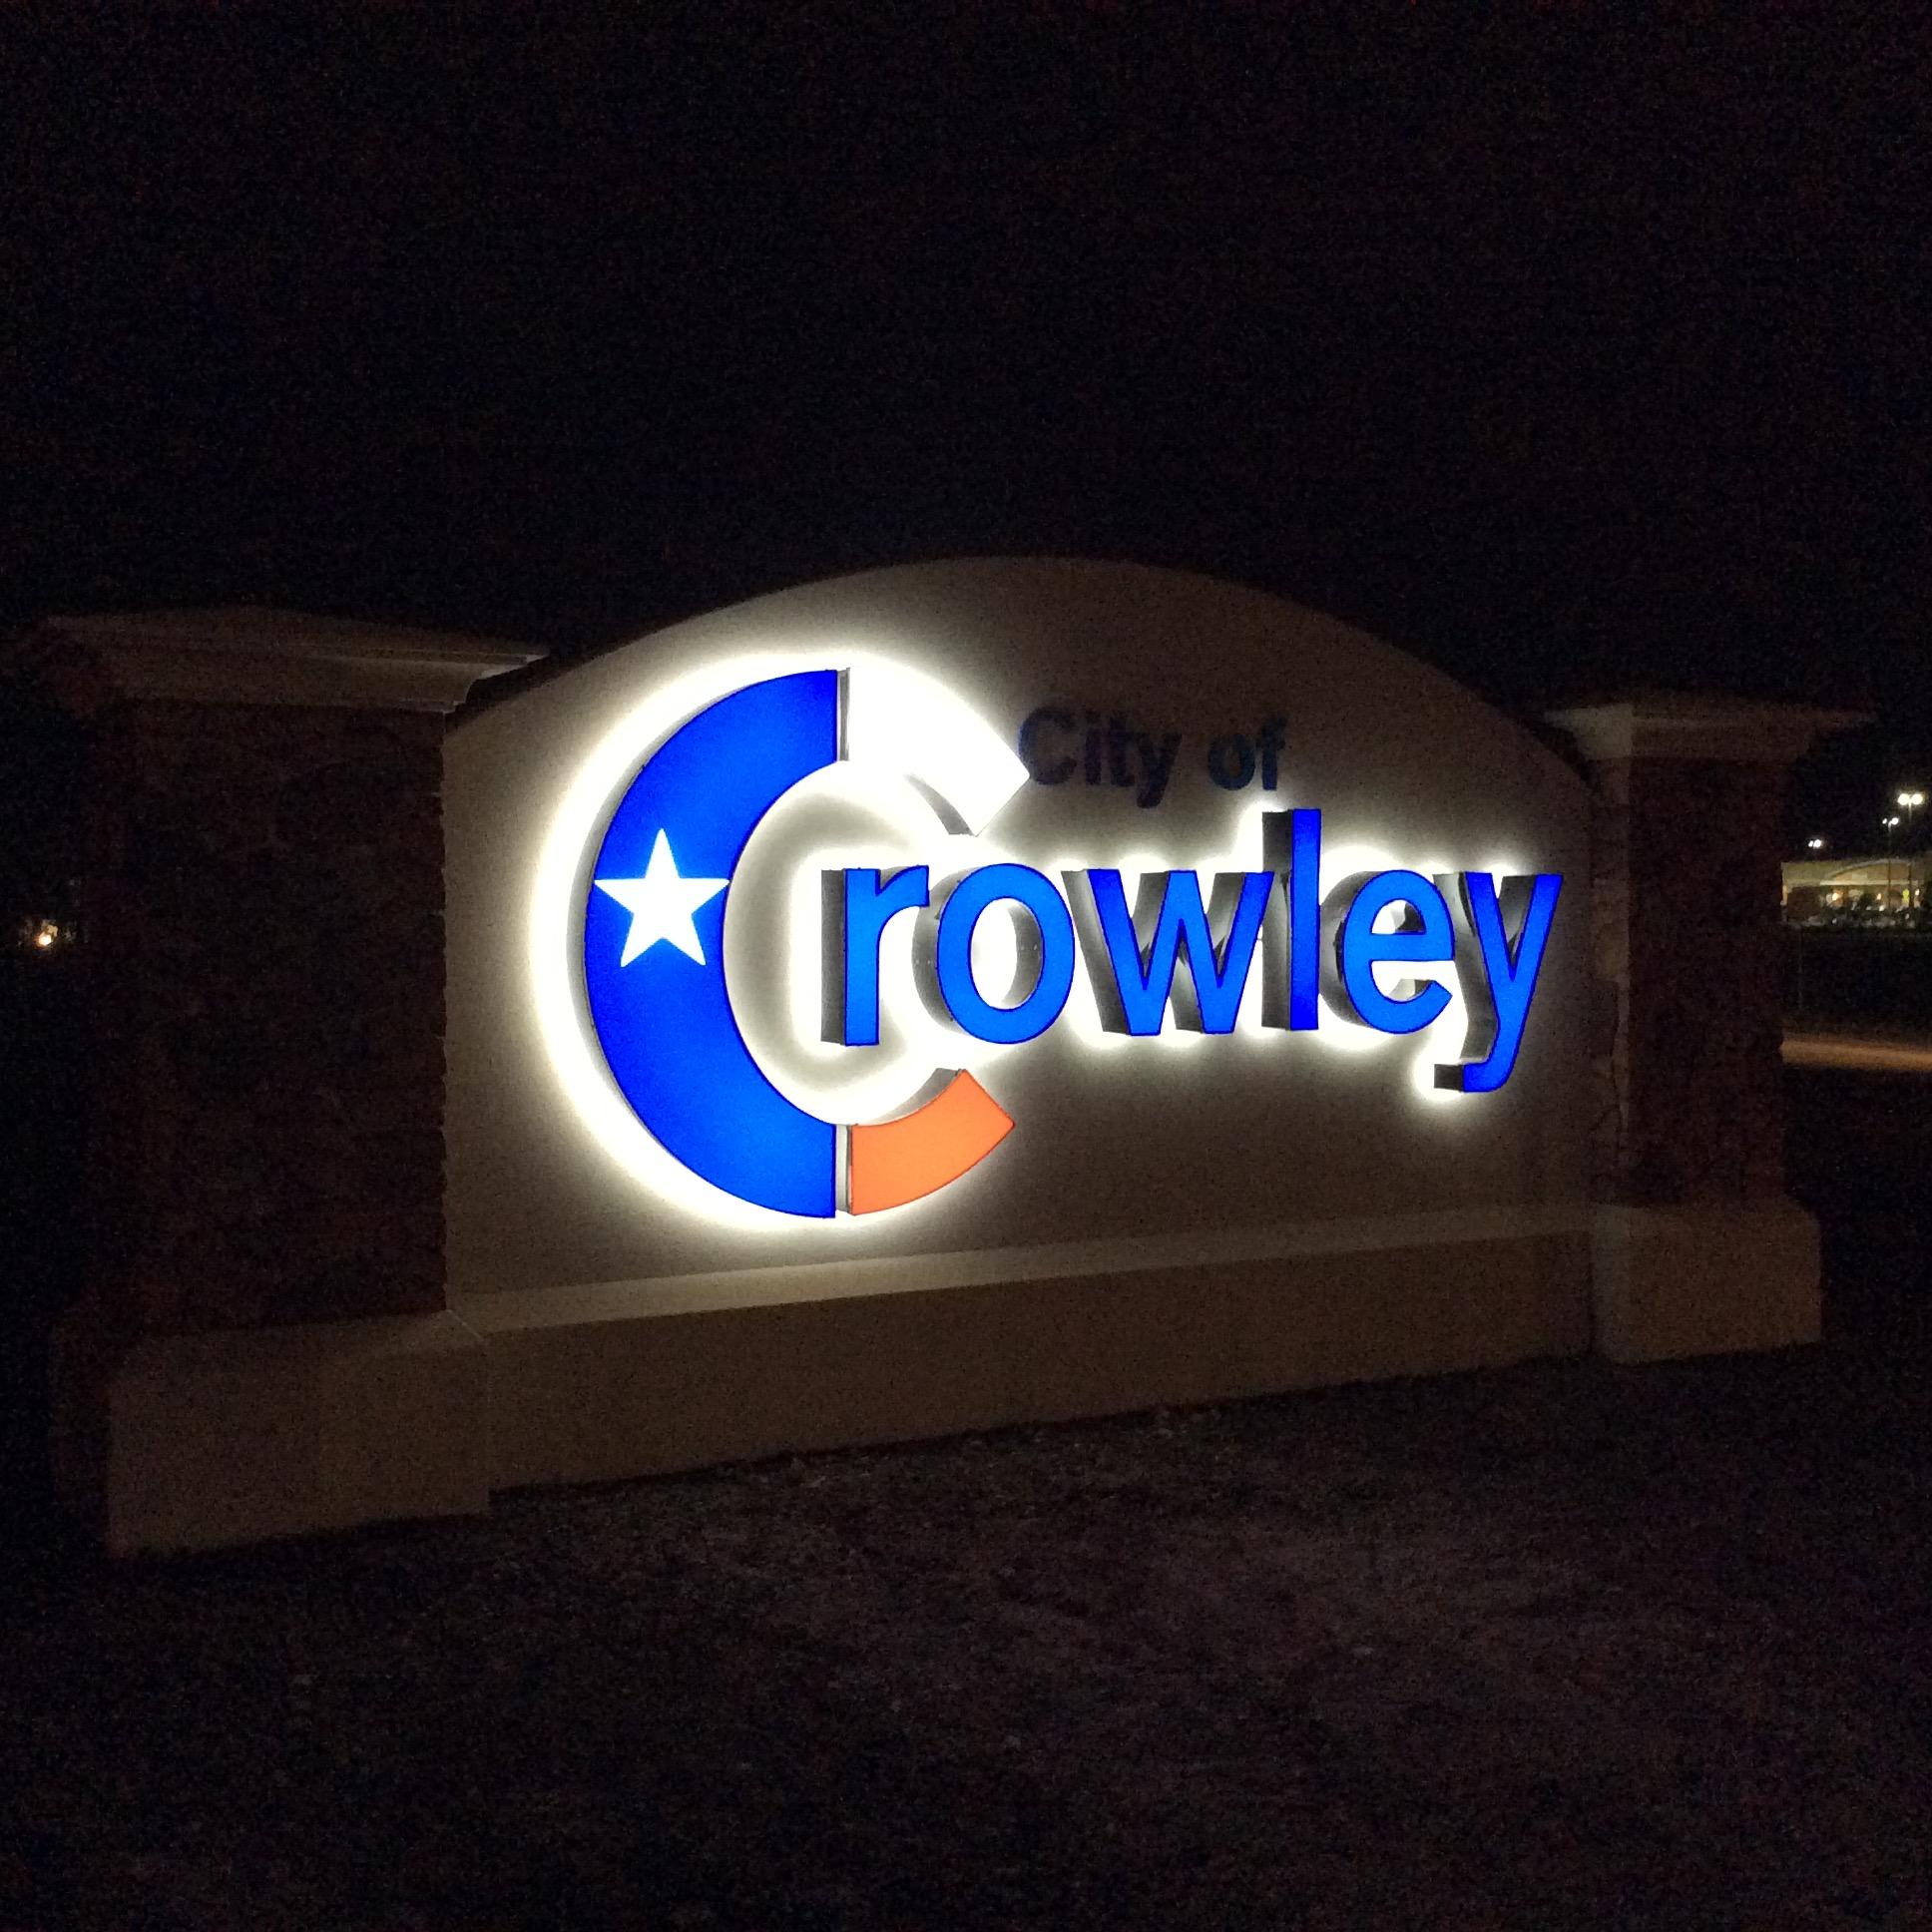 Crowley Night.JPG